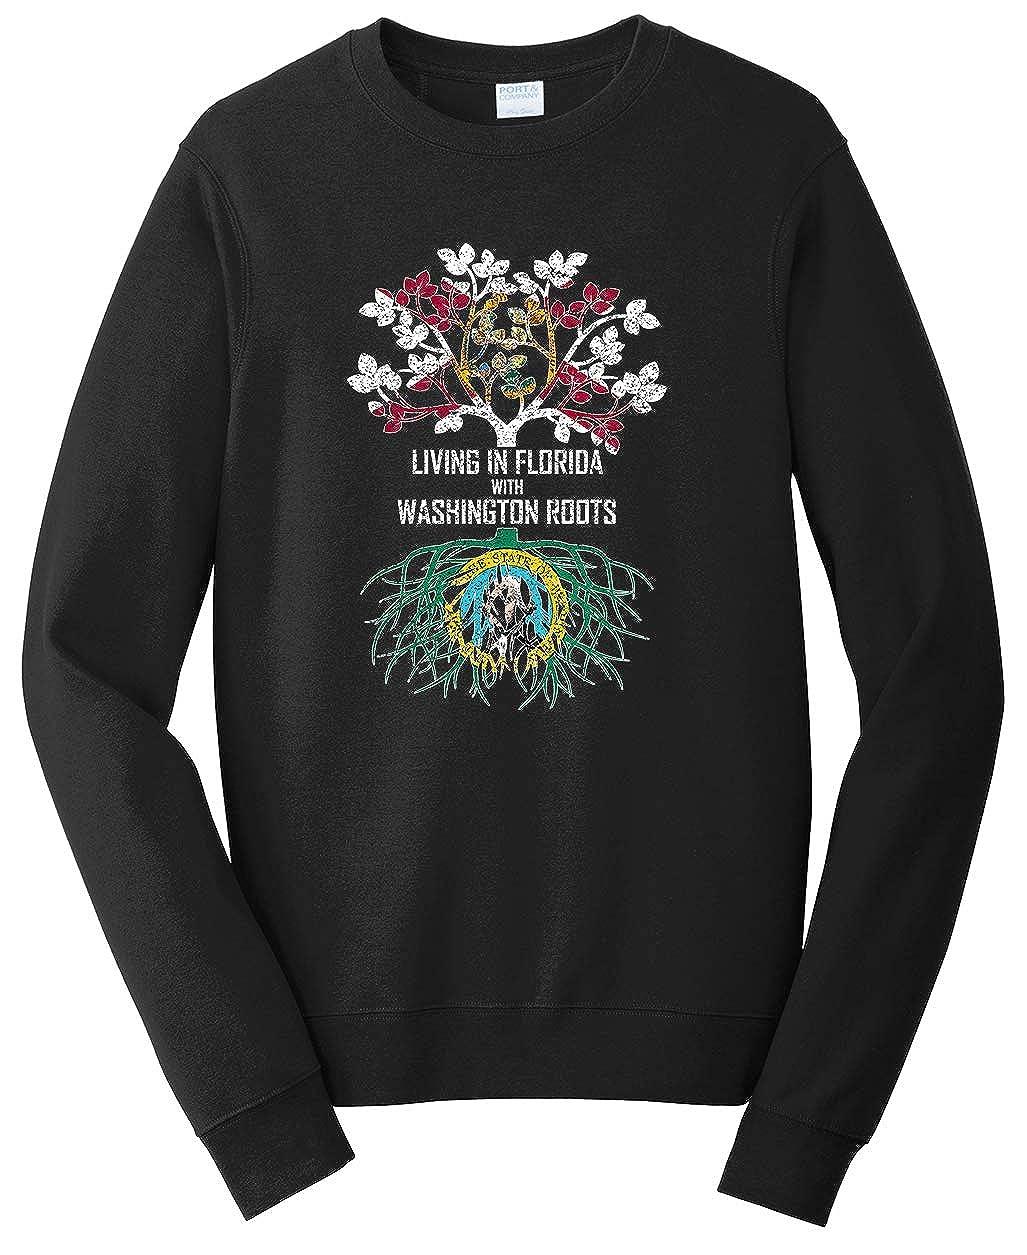 Tenacitee Unisex Living in Florida Washington Roots Sweatshirt